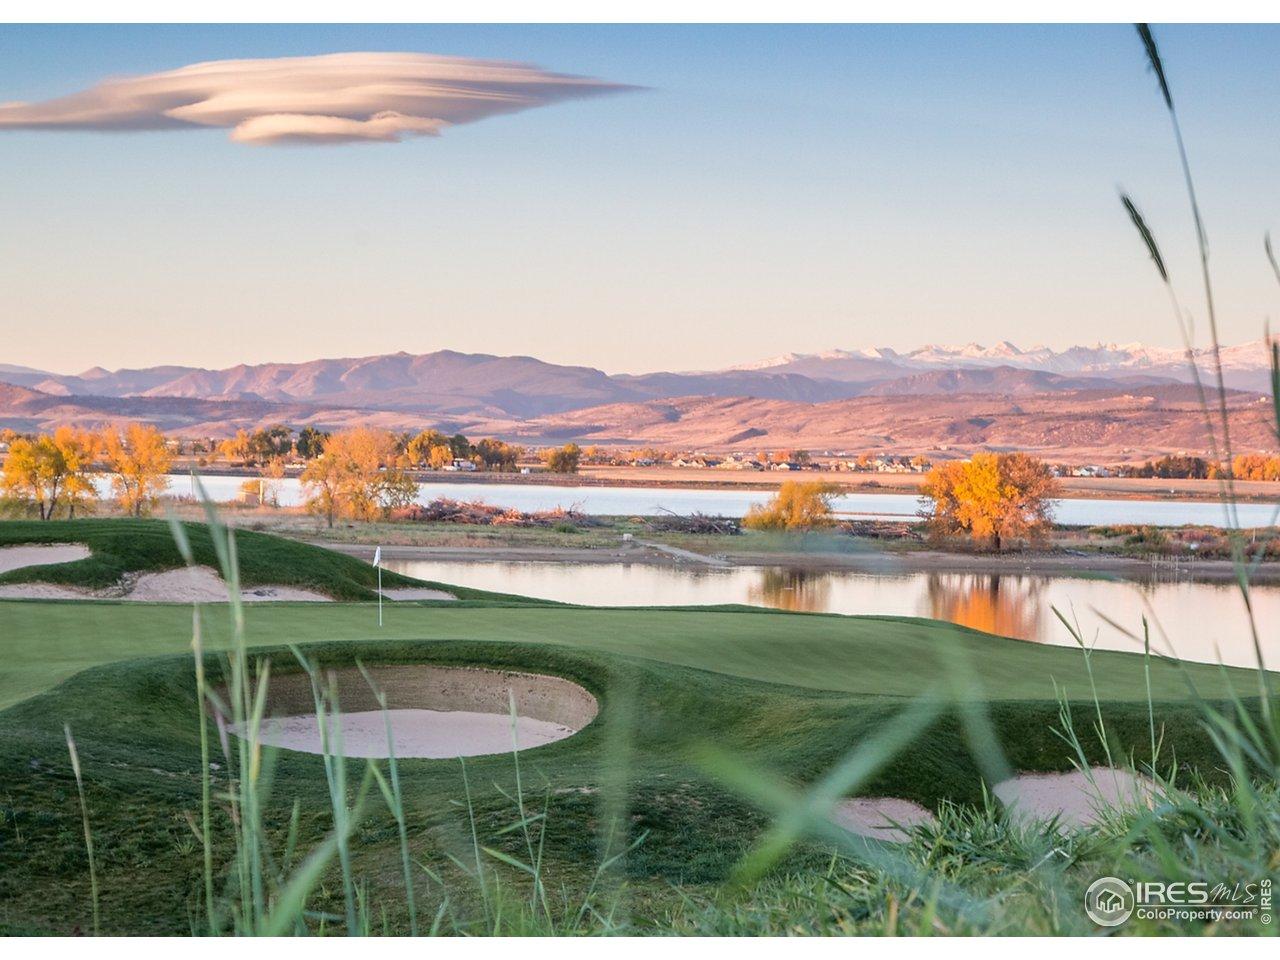 TPC Golf Course West Views